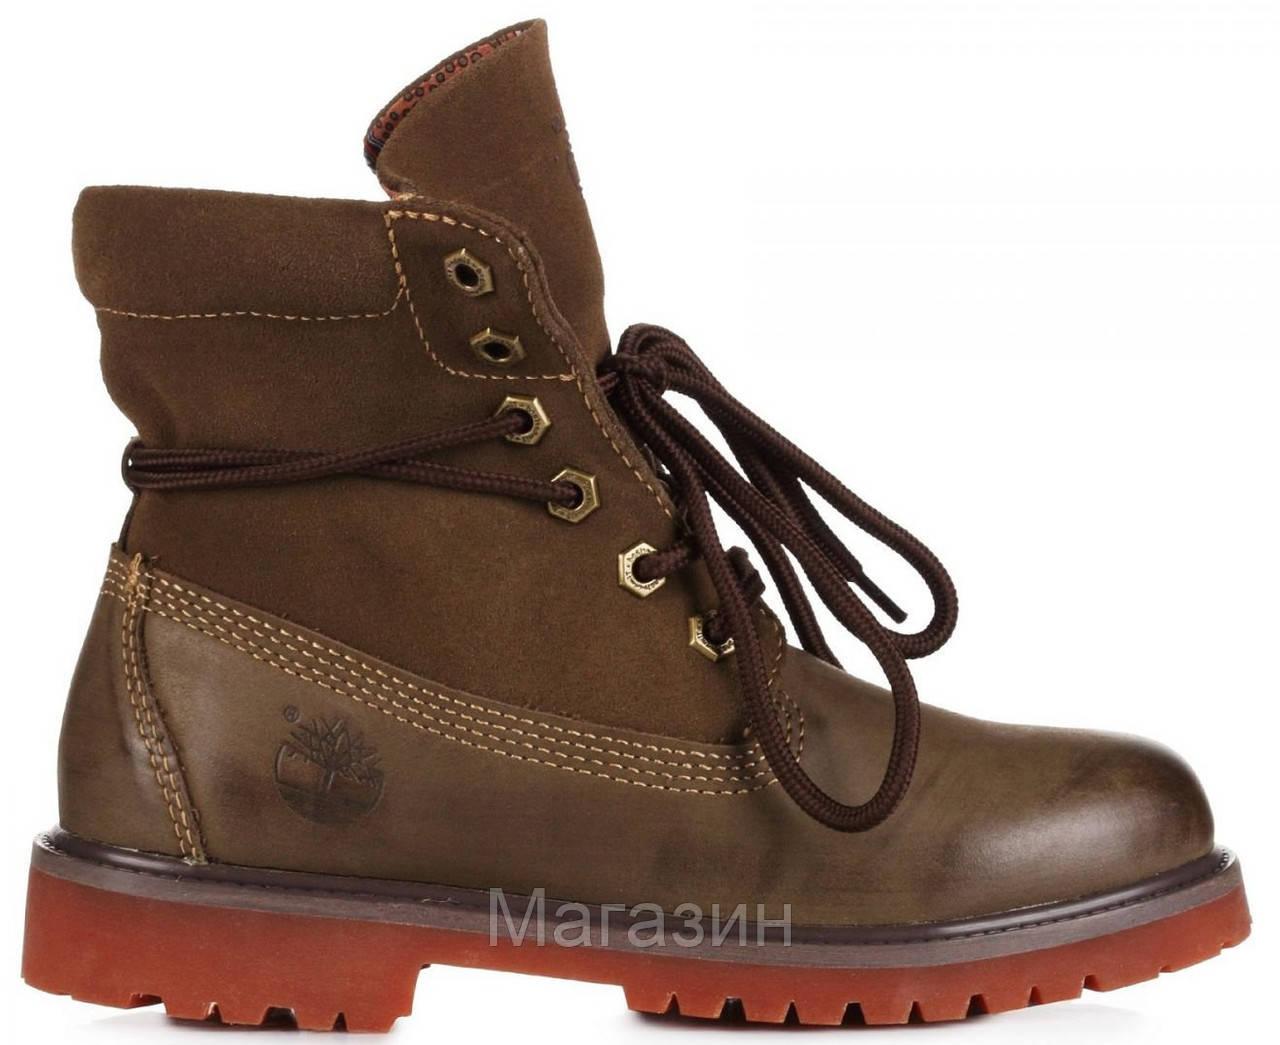 Женские ботинки Timberland Roll-Top Bandits Khaki Тимберленды хаки